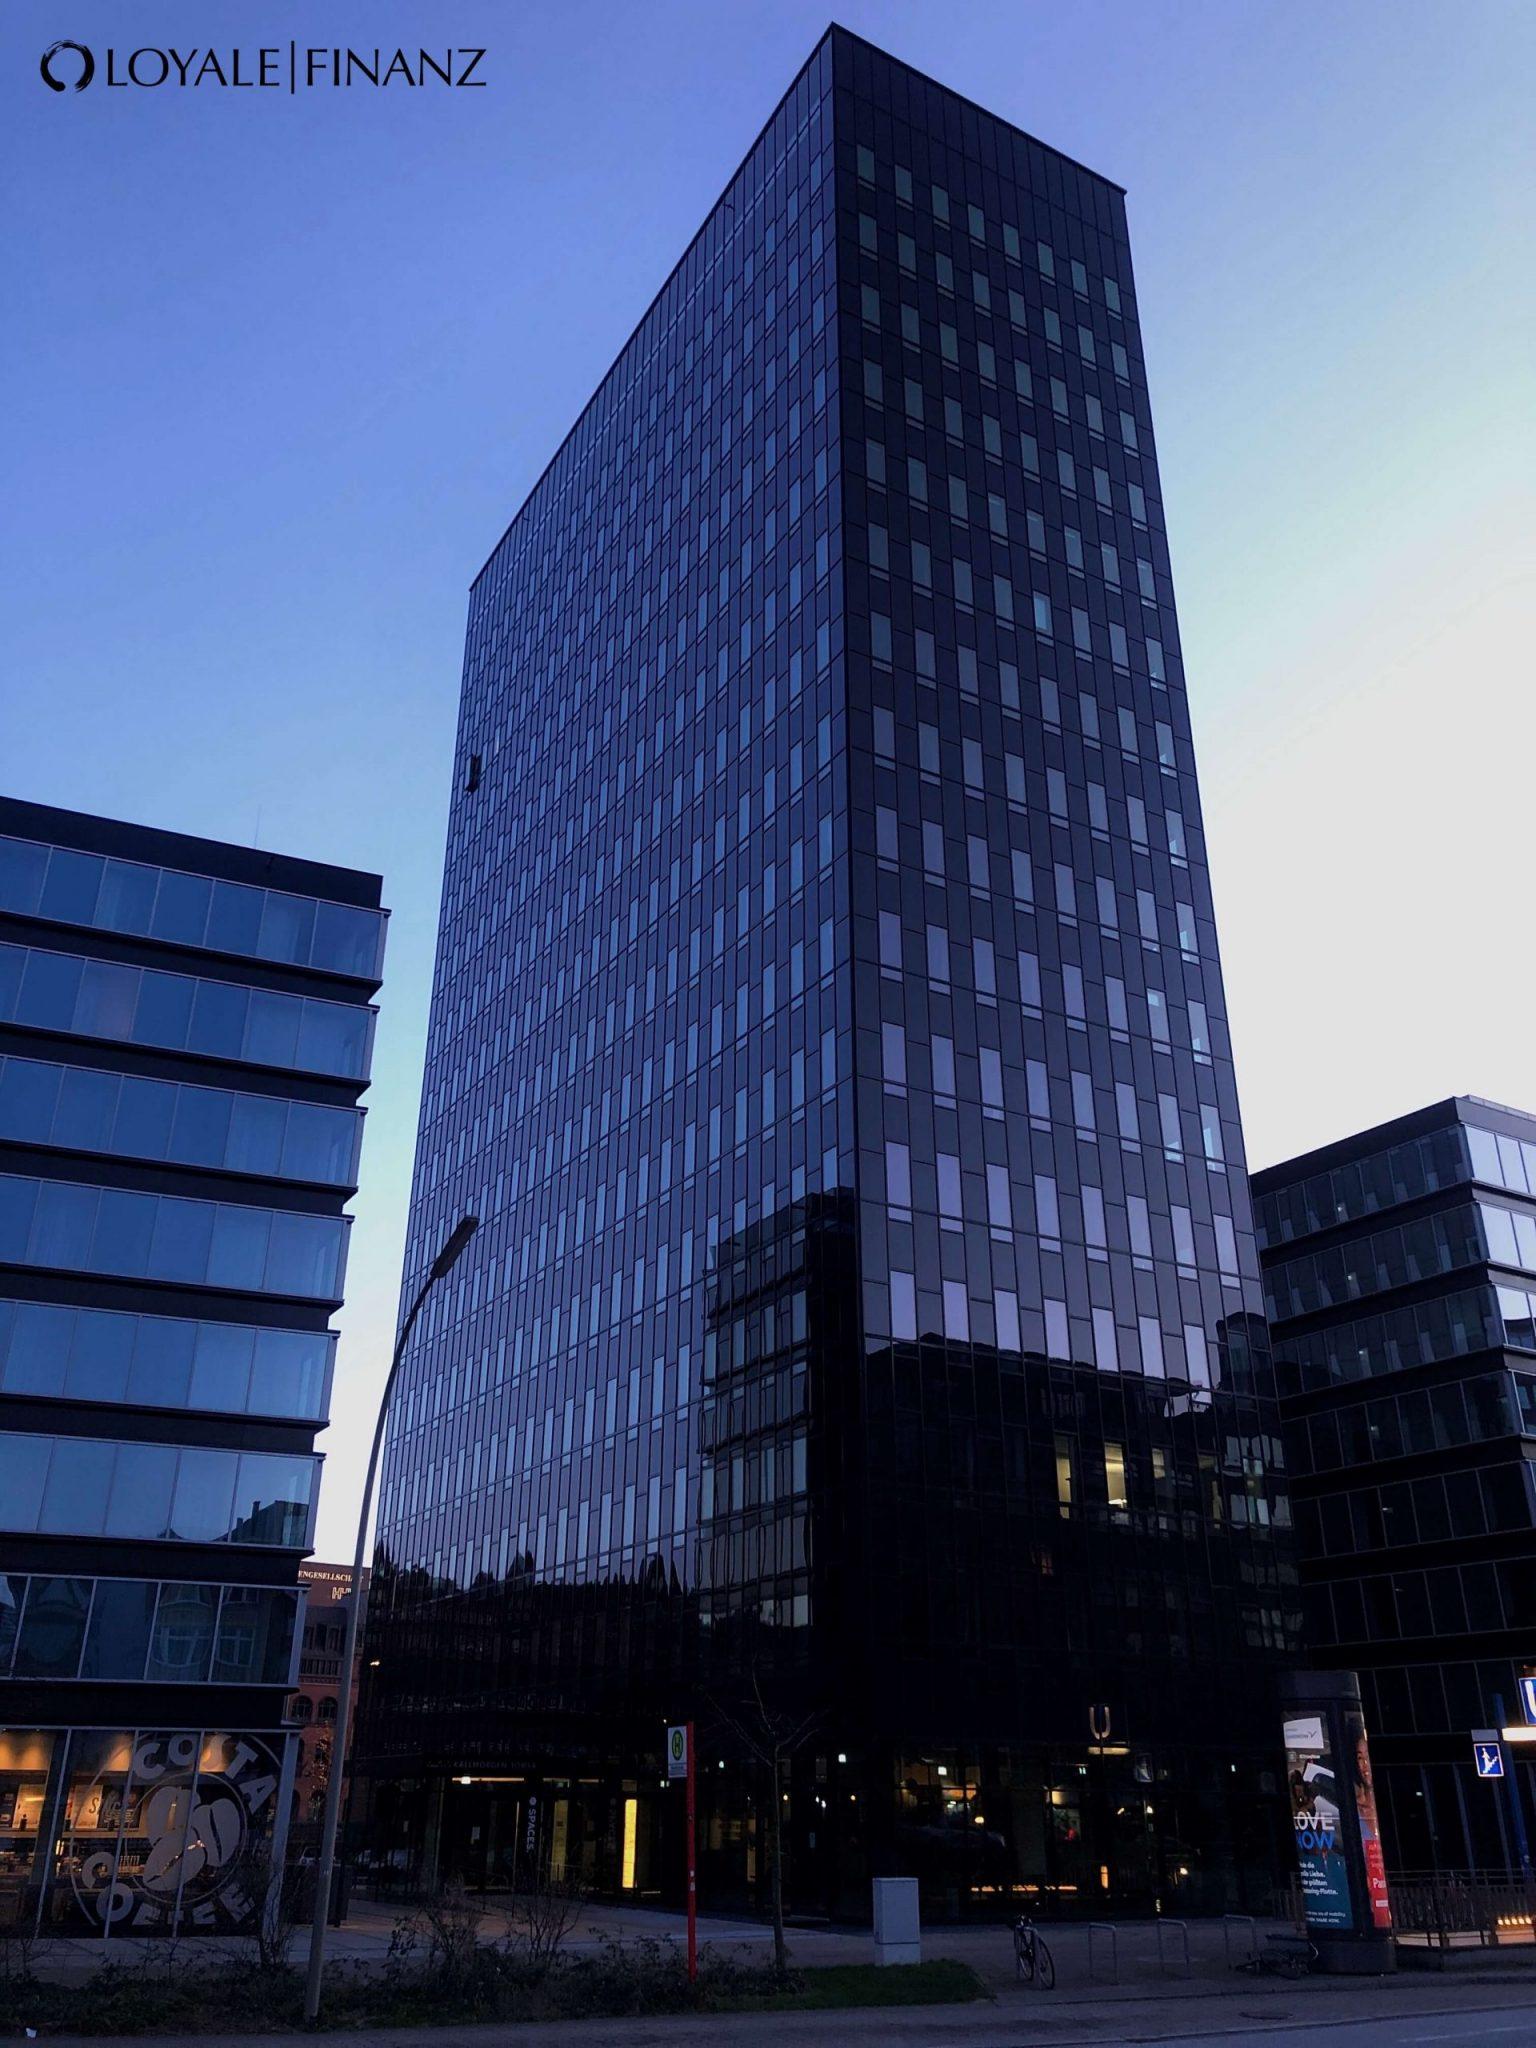 LOYALE FINANZ Büro Kallmorgen Tower